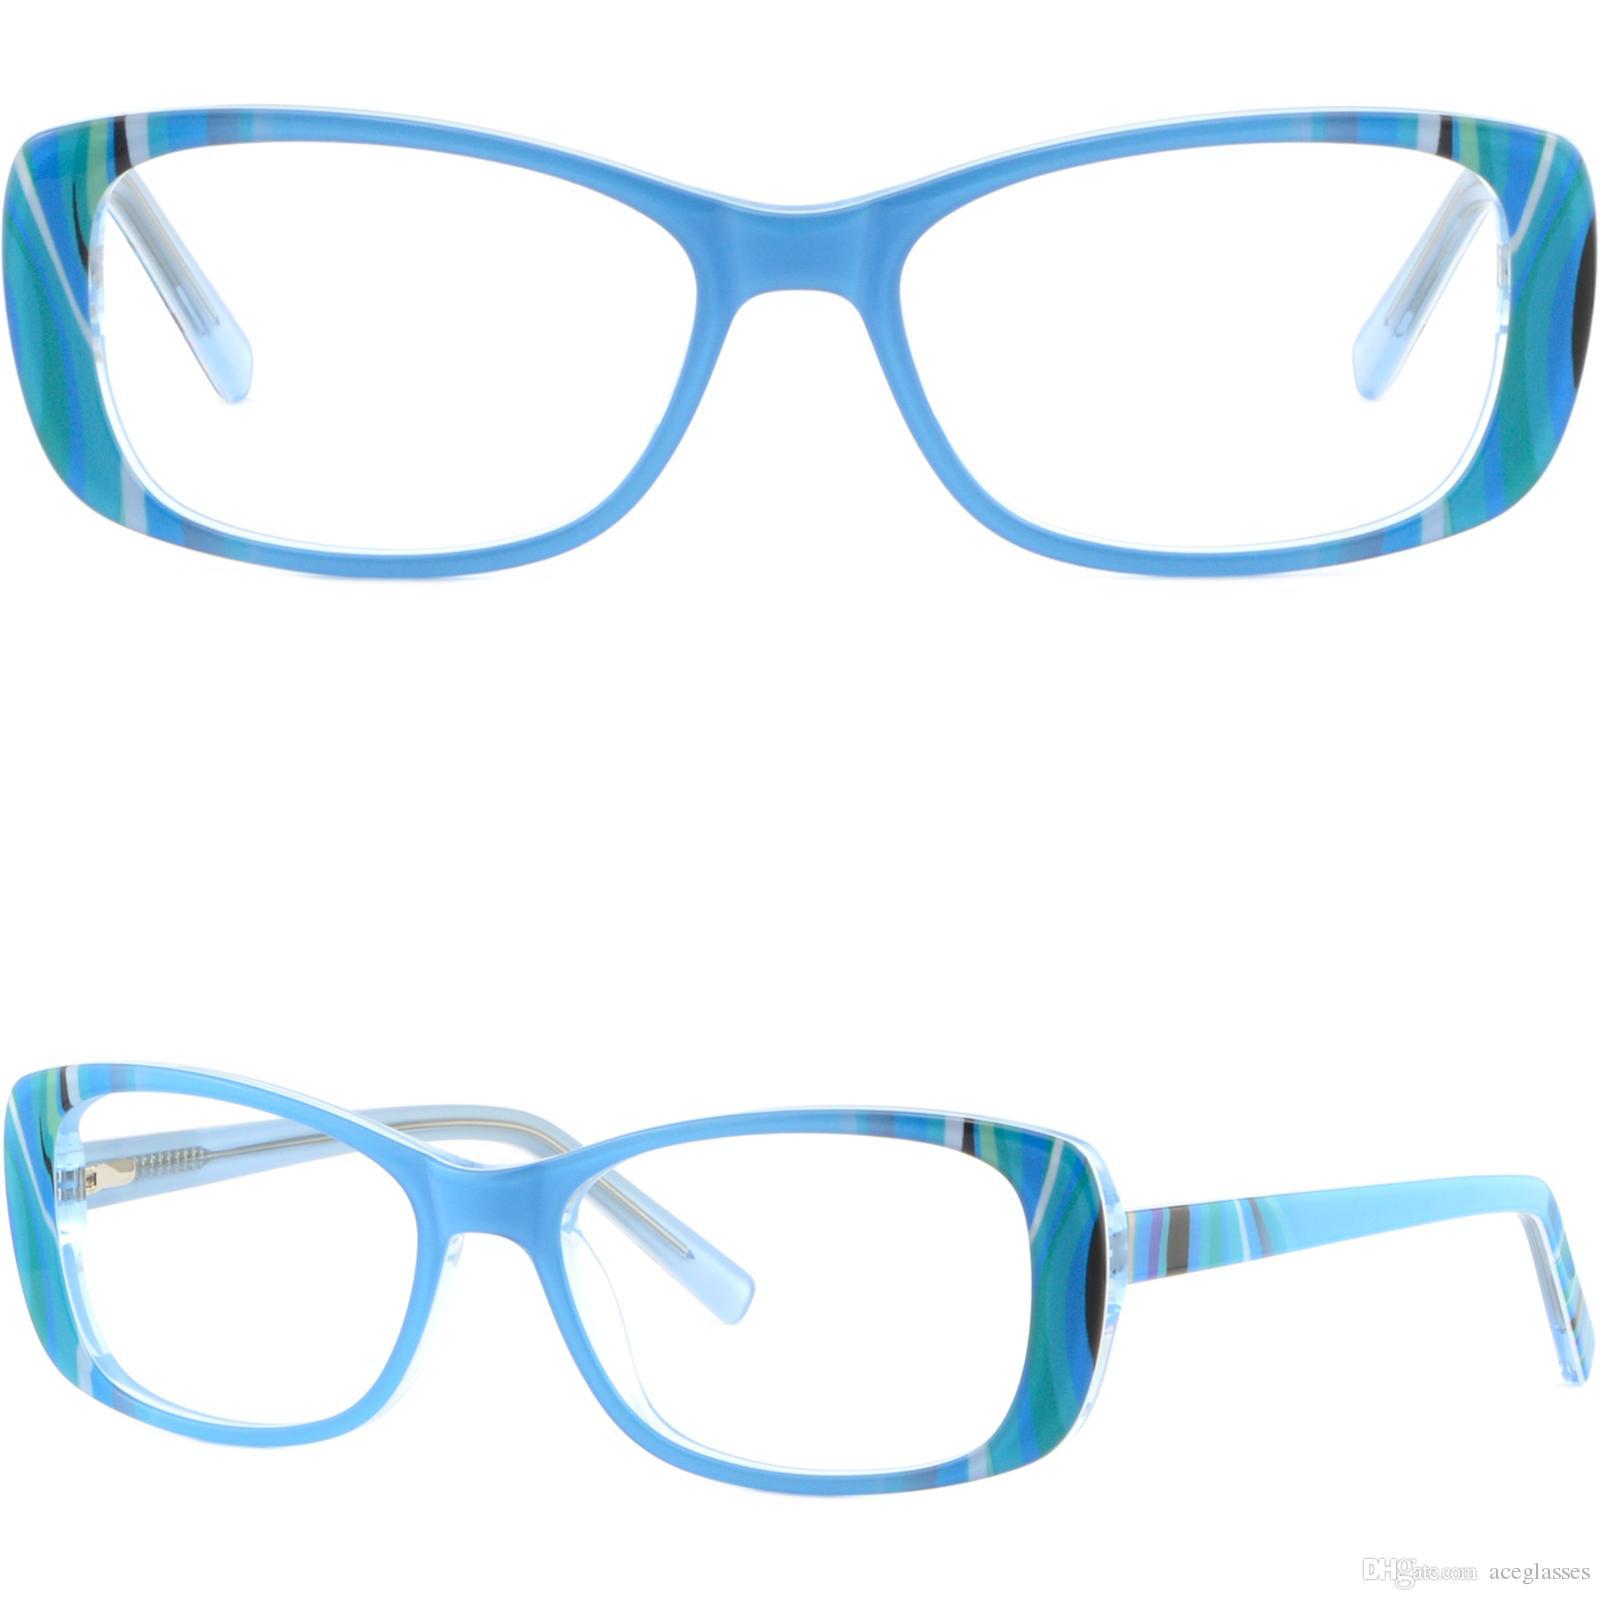 Blue Rectangle Women\'s Frames Acetate Prescription Glasses ...